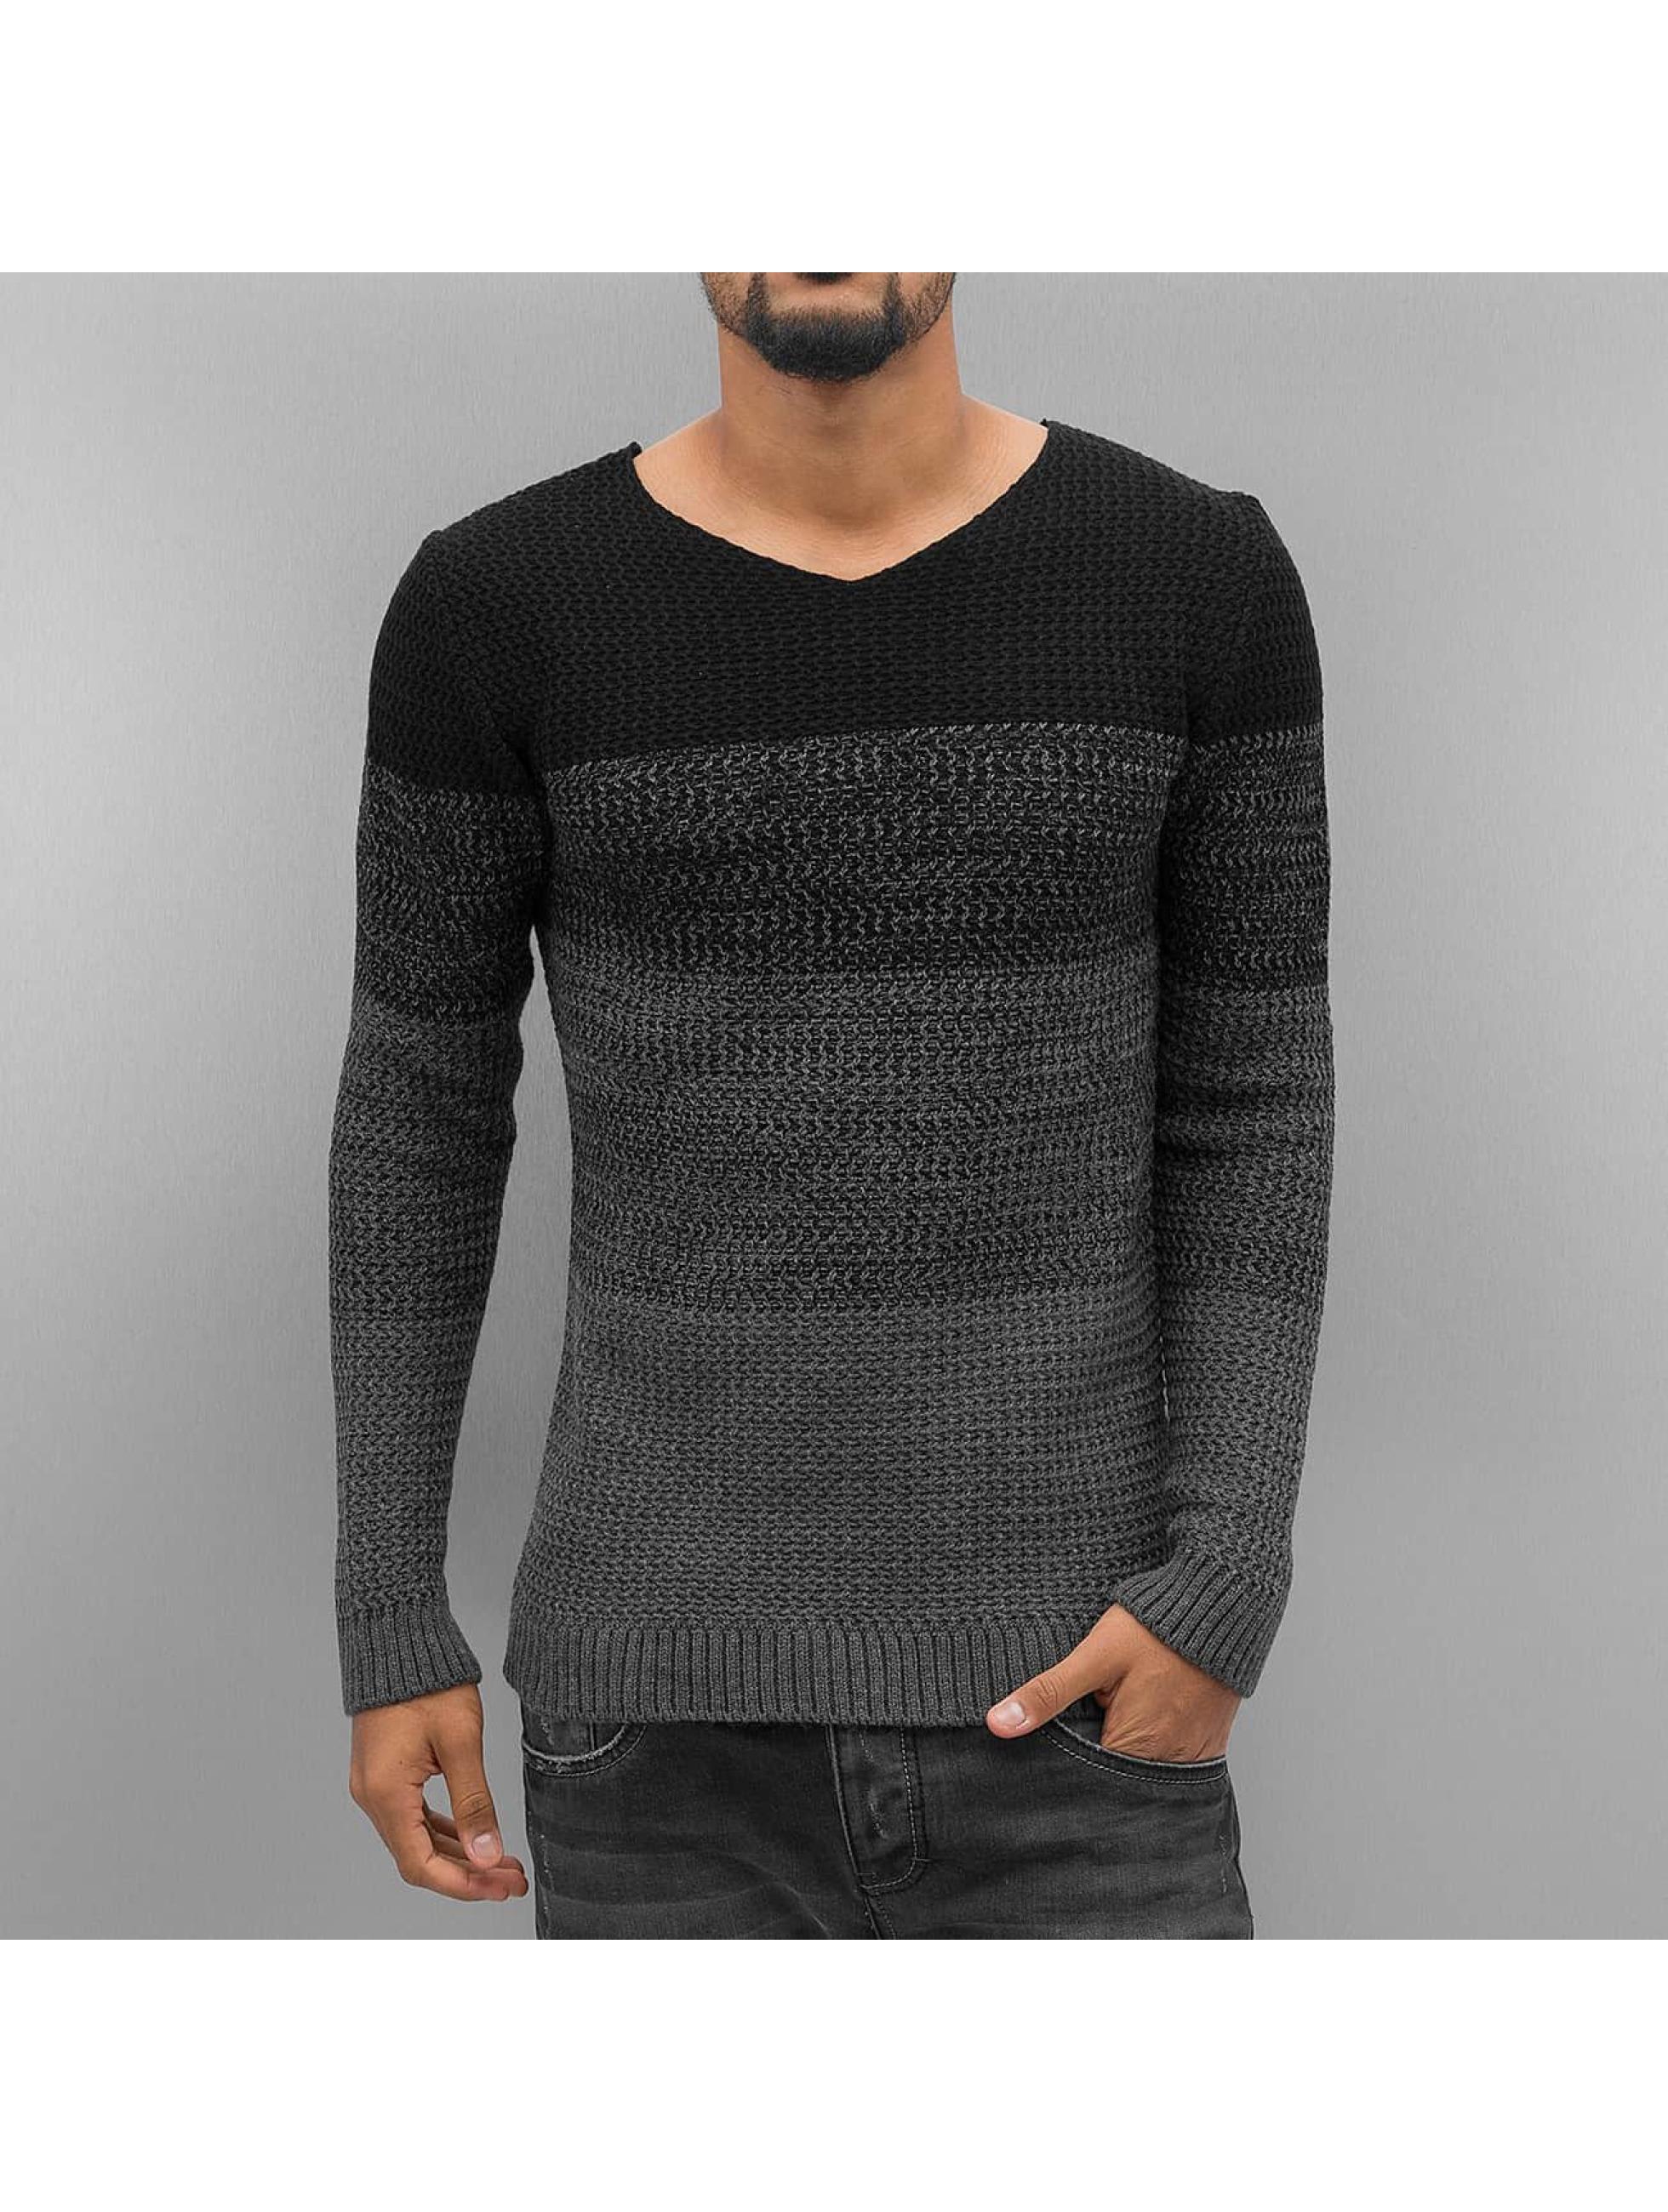 VSCT Clubwear Männer Pullover Kyushu Printed in schwarz